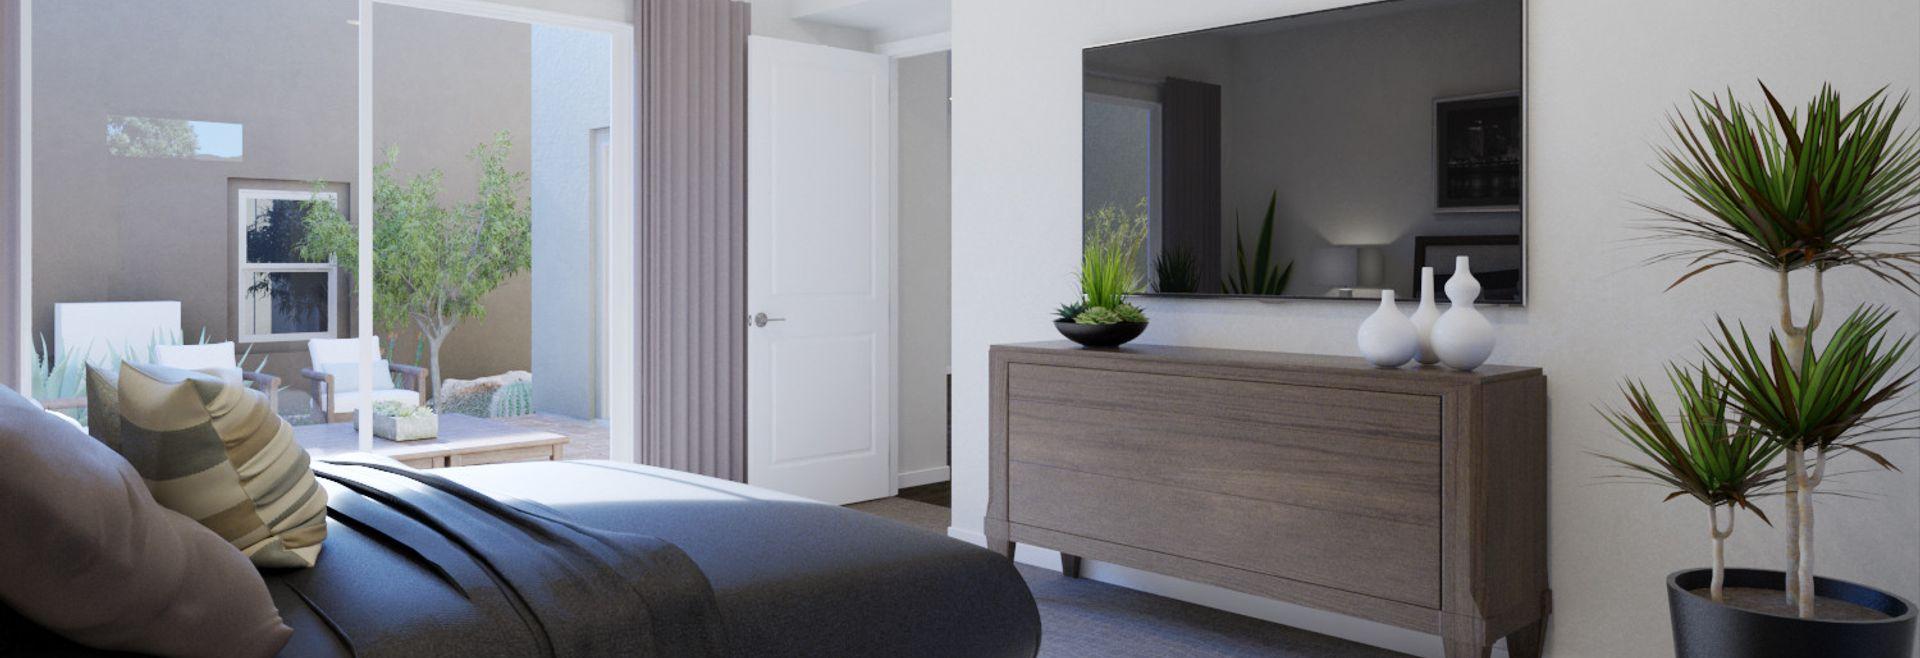 Trilogy Summerlin Luminous Master Bedroom